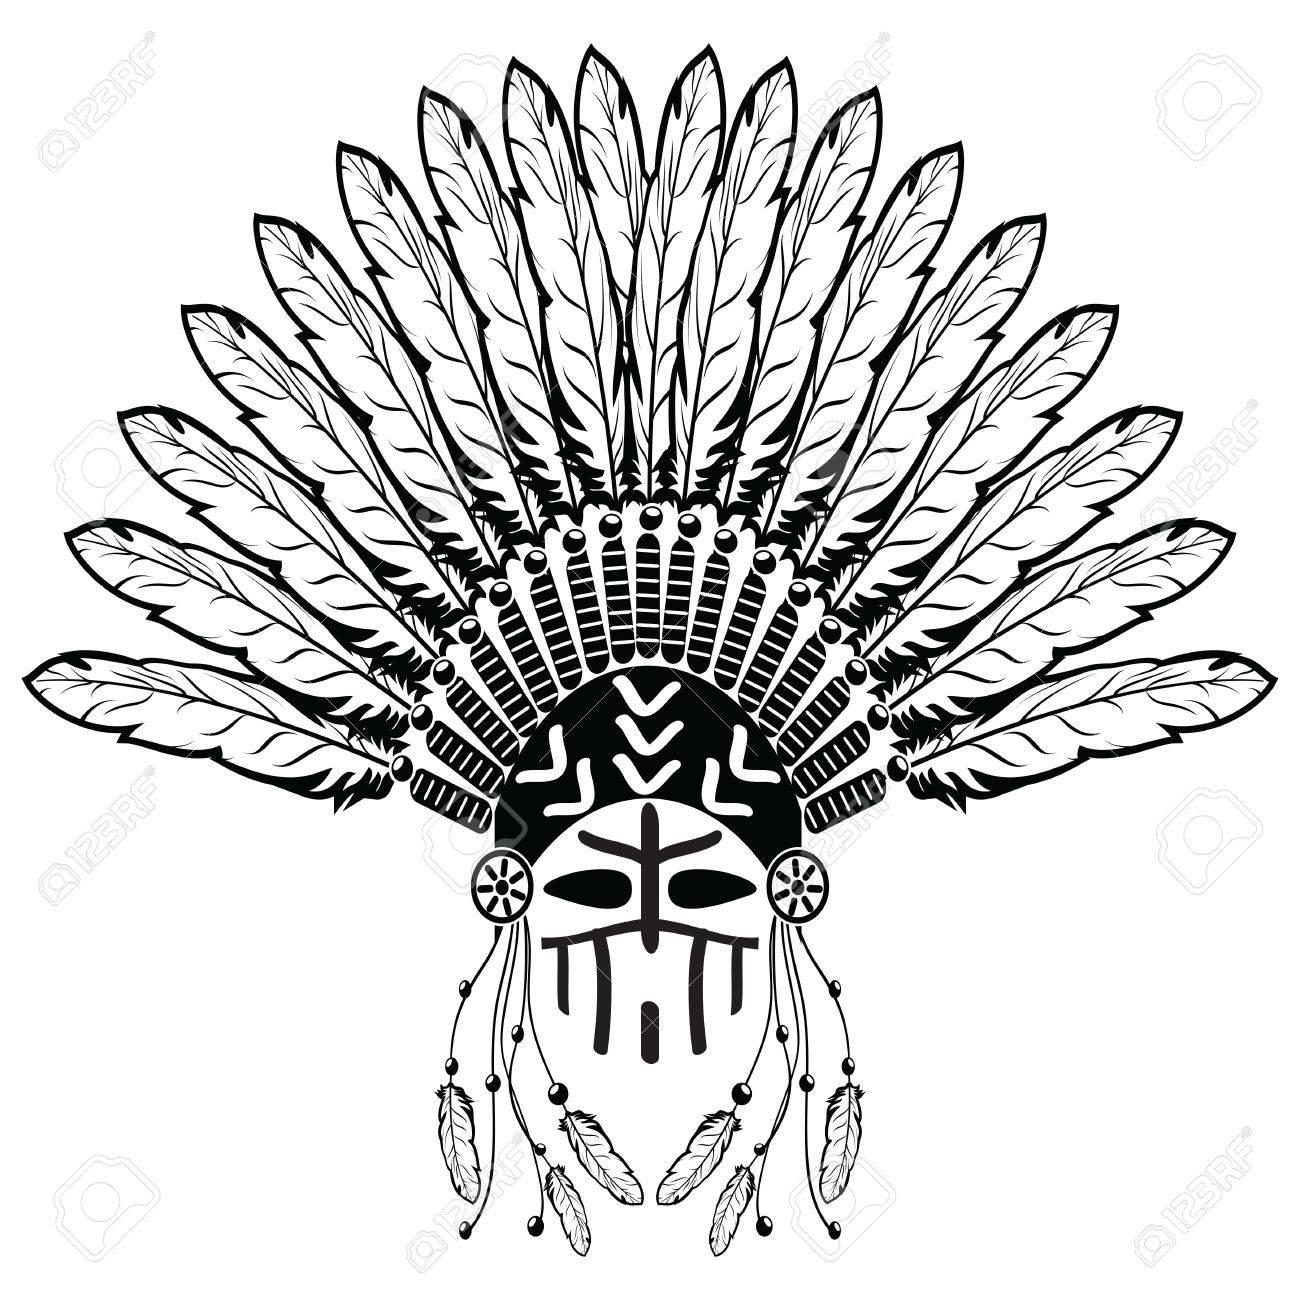 Aztec ethnic style headdress with plain feathers beads symbolizing aztec ethnic style headdress with plain feathers beads symbolizing native american tribes and warrior buycottarizona Images